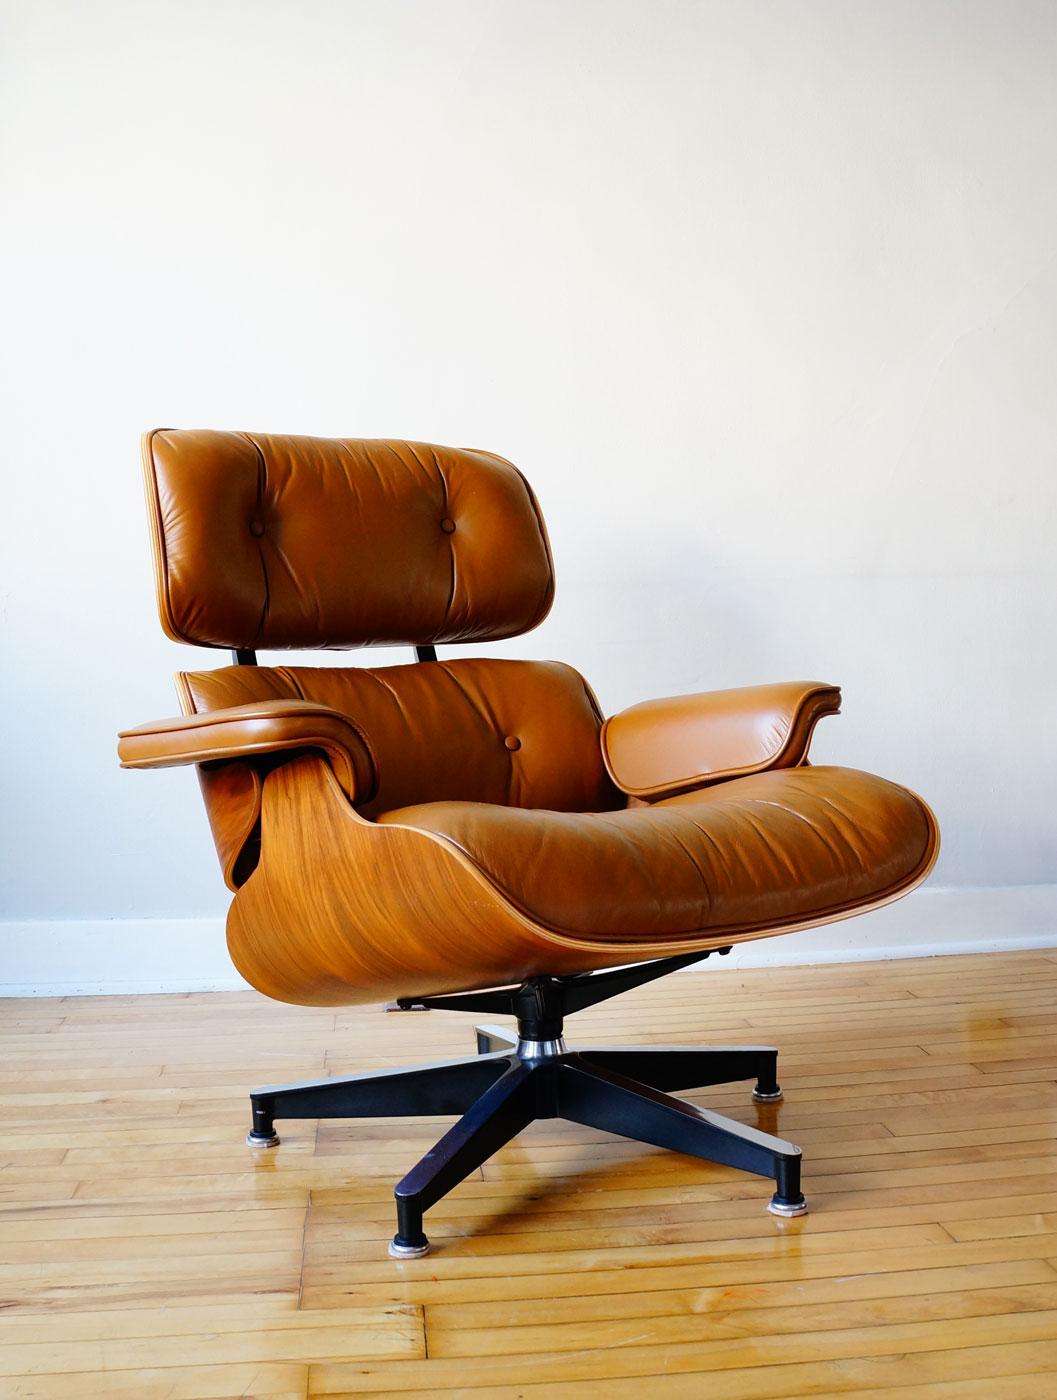 Herman Miller Lounge Chair Ergonomic Hip Pain Str8mcm